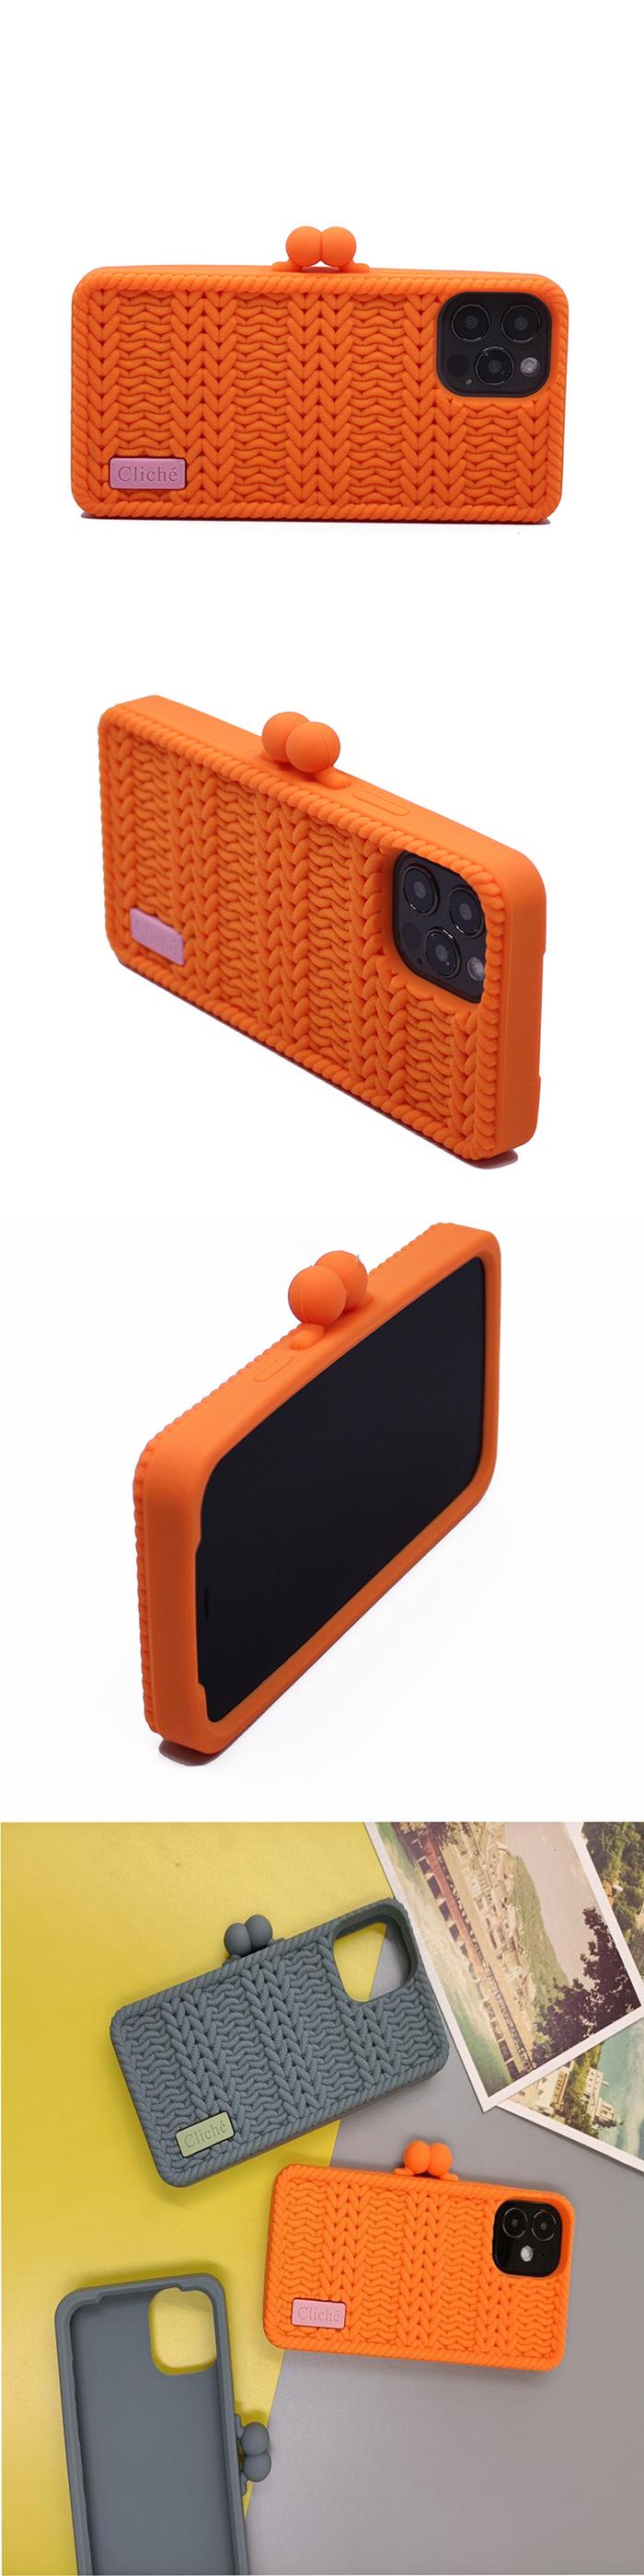 Candies|Cliche針織 雙珠扣錢包(橘)-iPhone 12 / 12 Pro